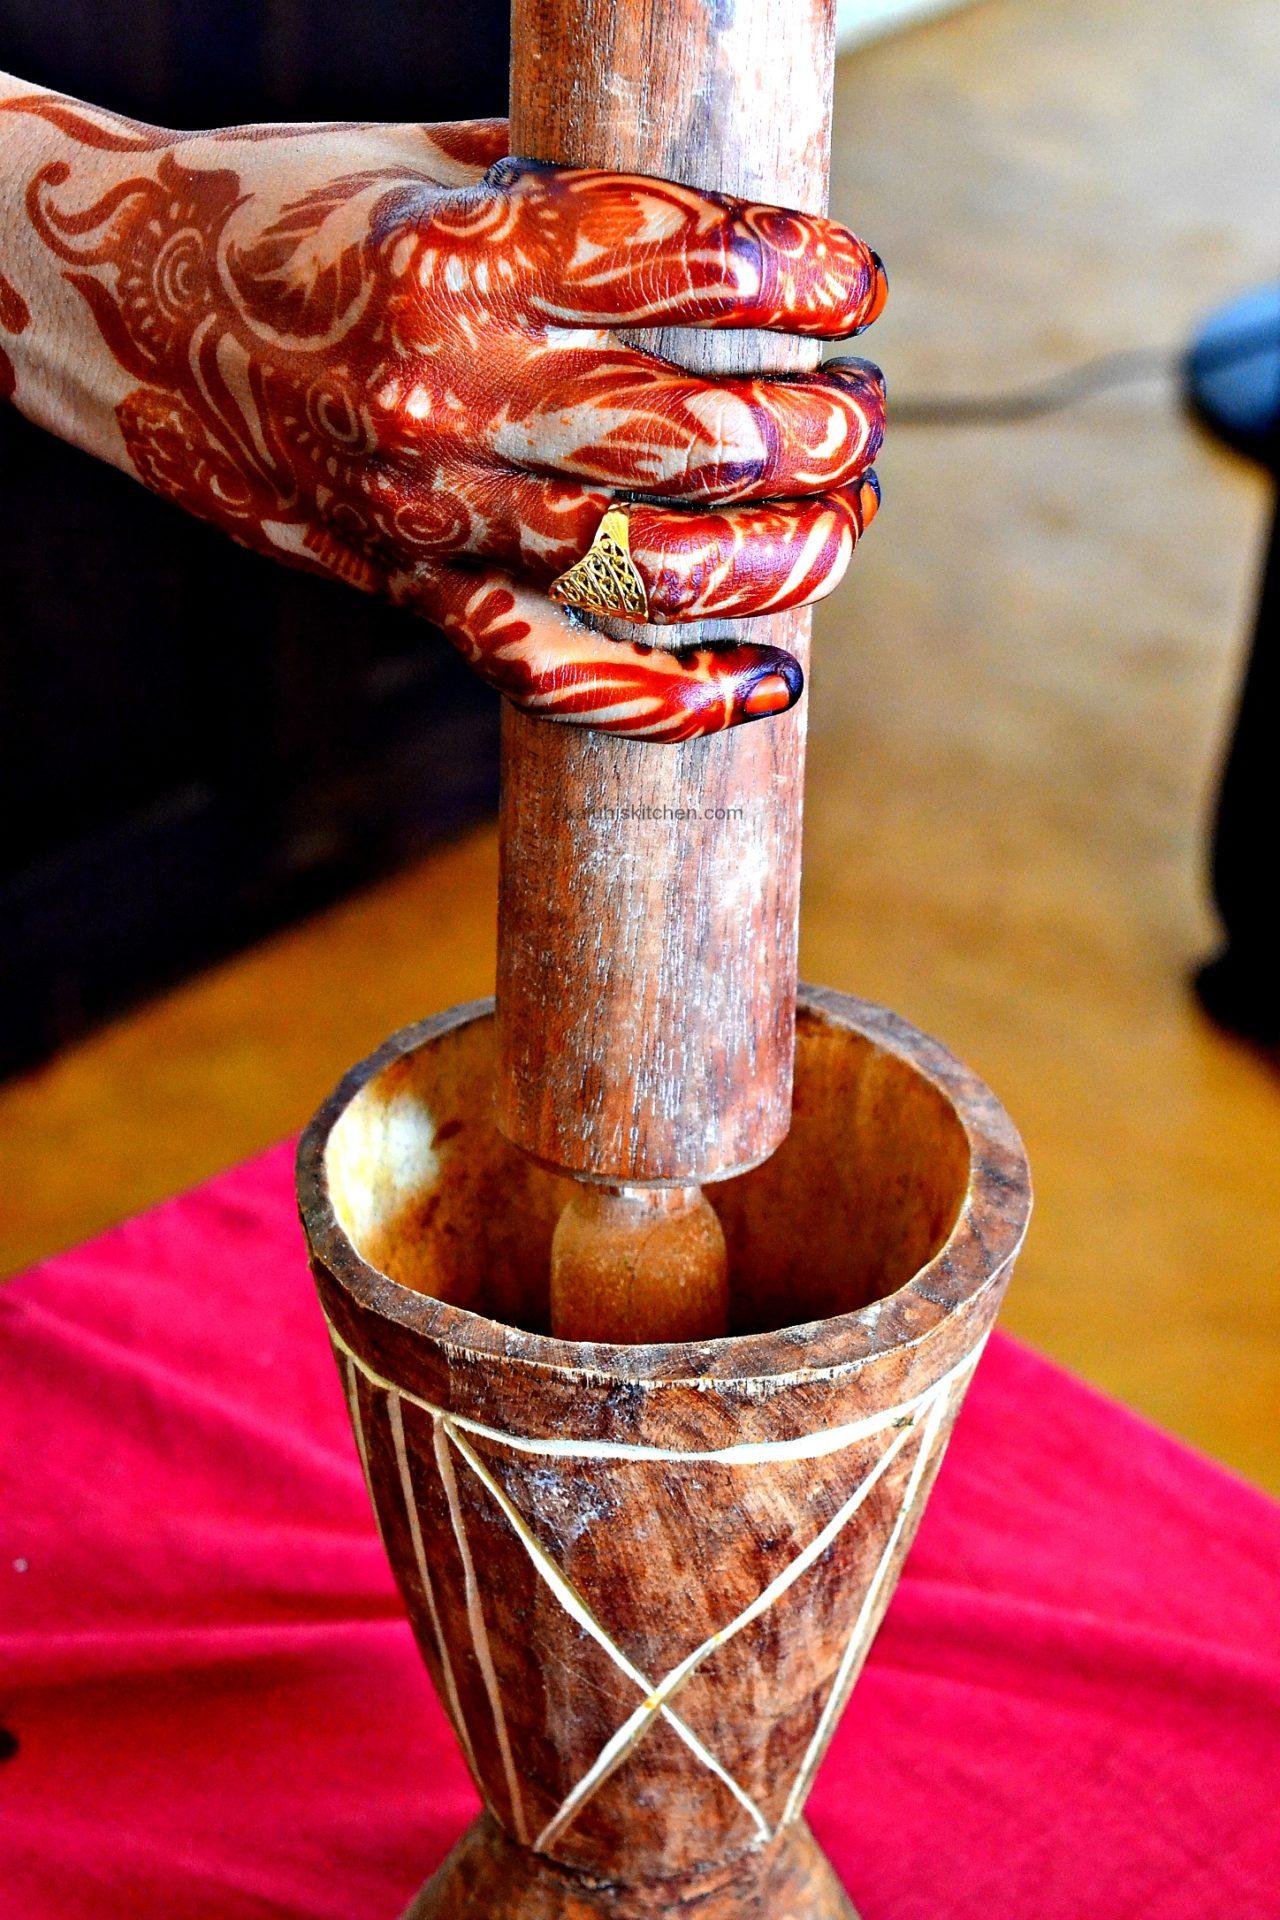 Kenyan culture_henna_kinu_pestle and mortar_Lamu food Festival_kaluhiskitchen.com_faluda